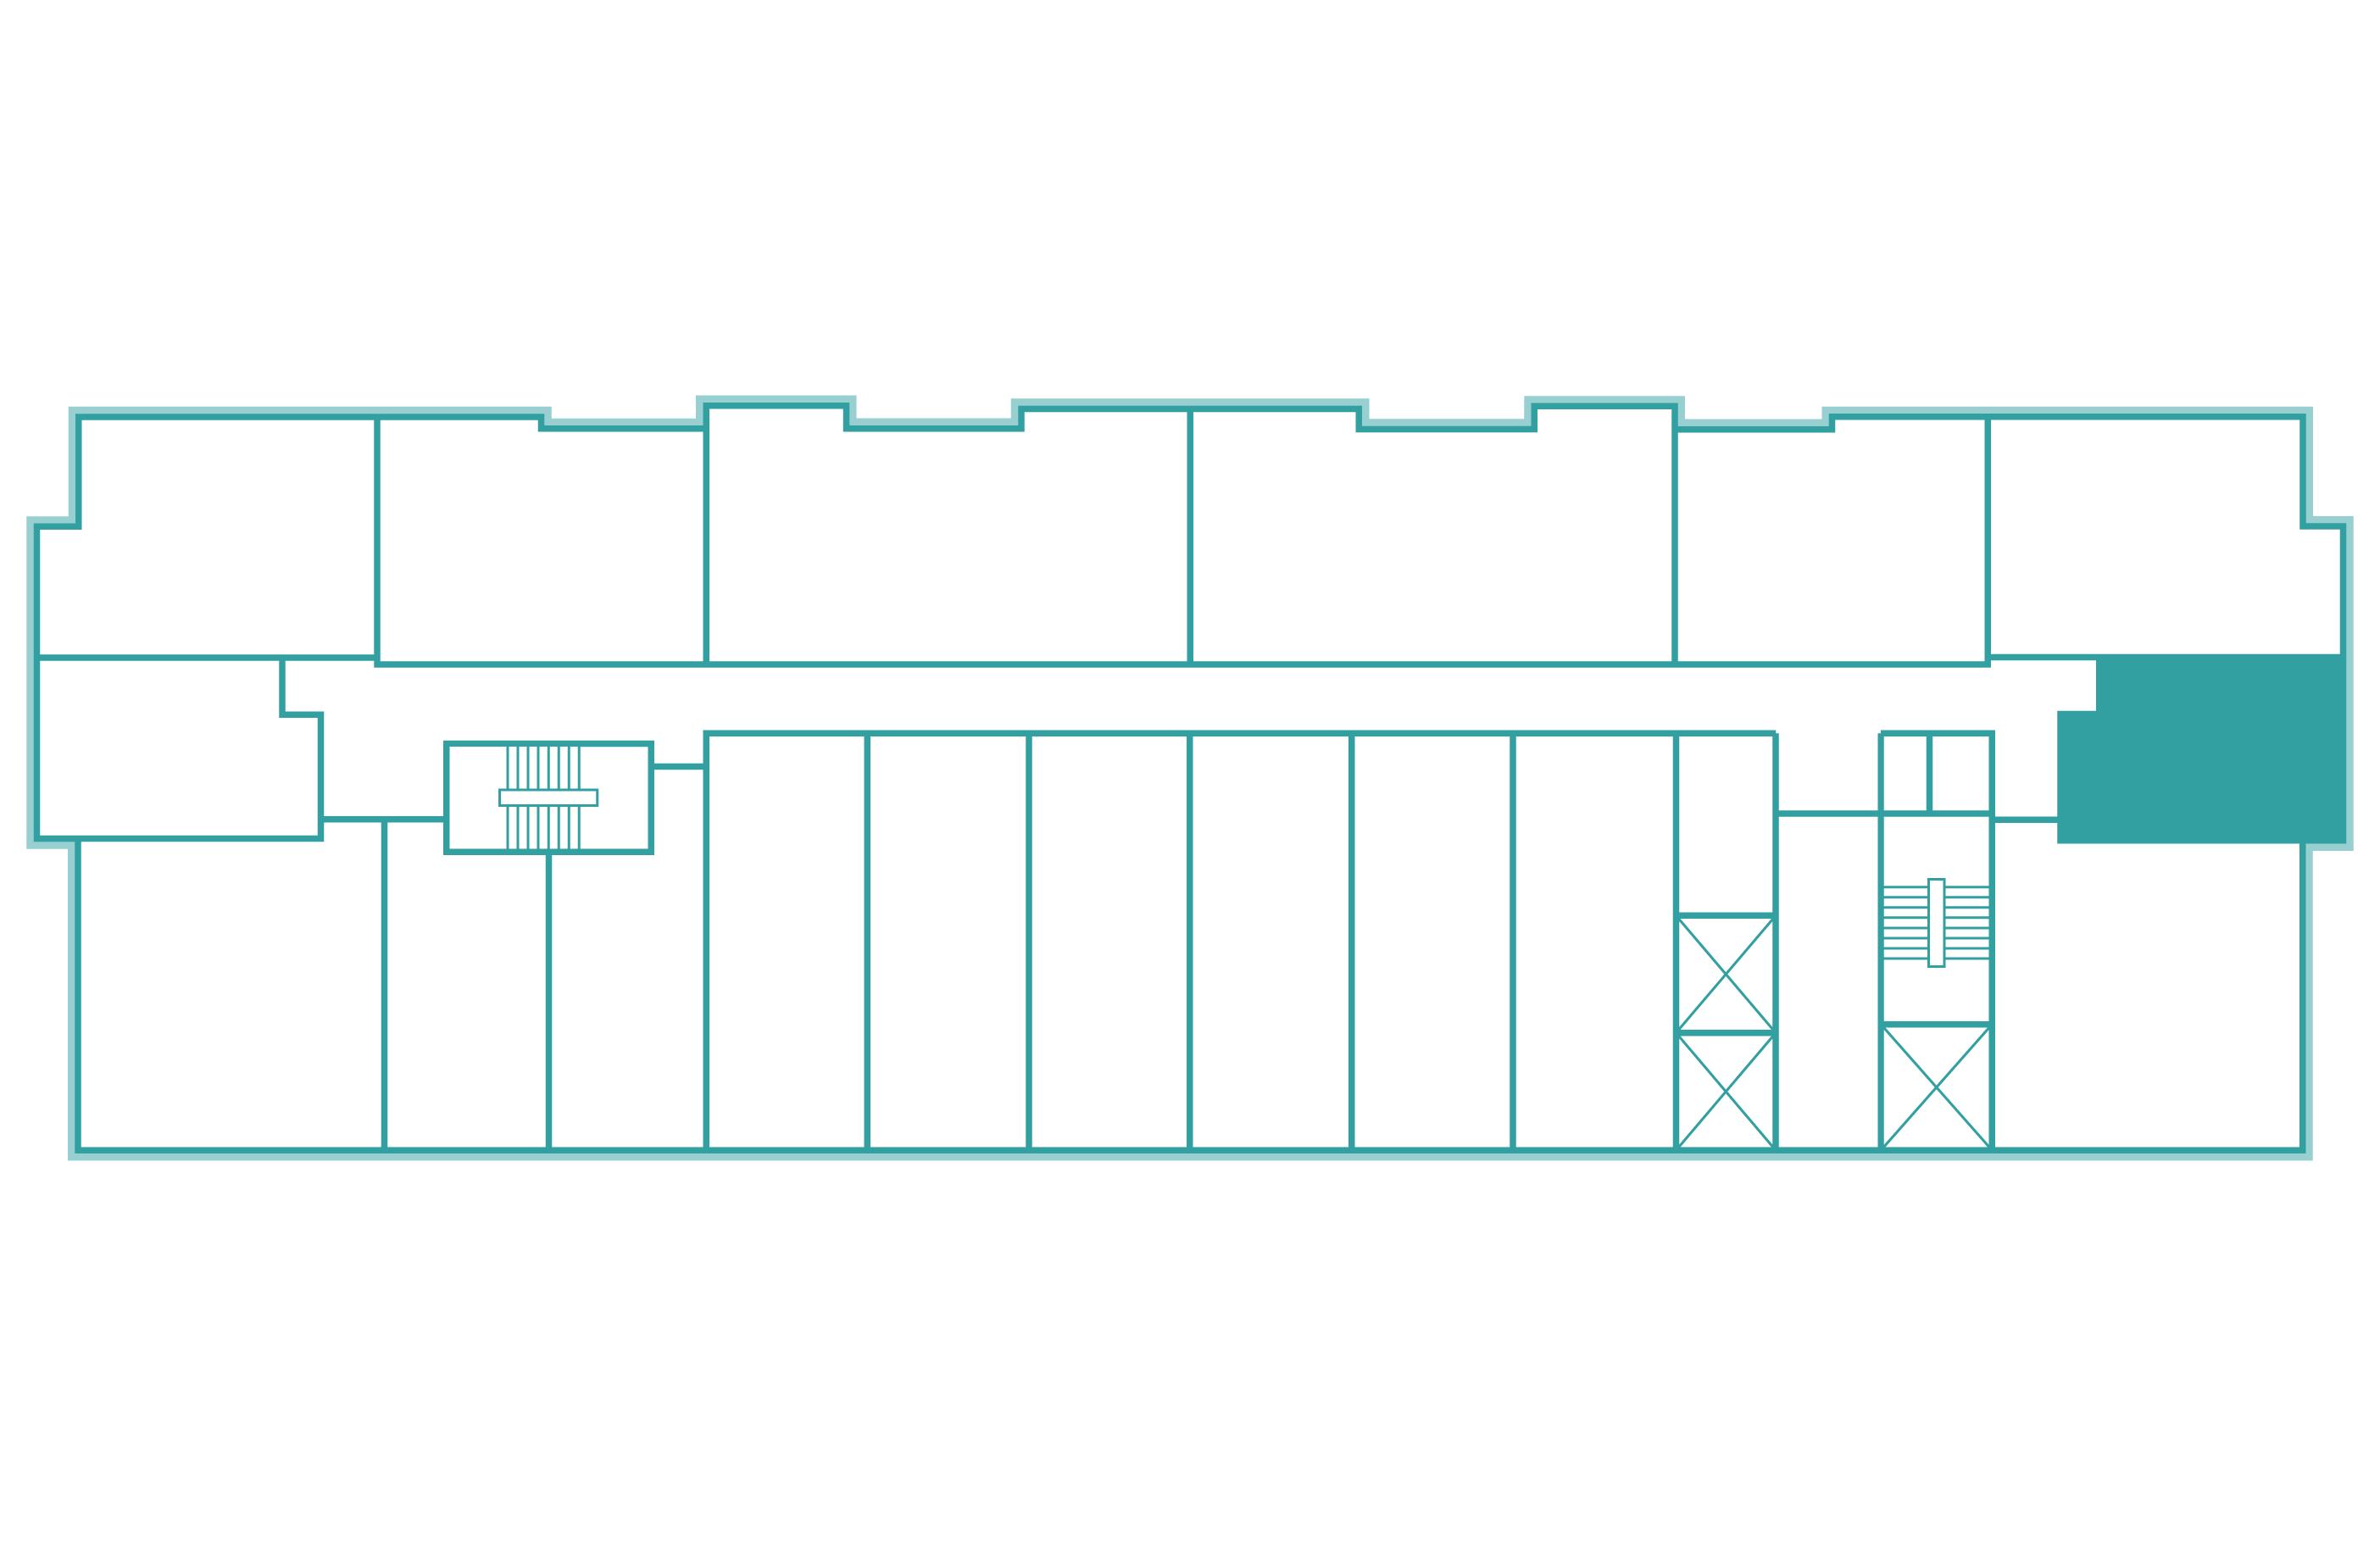 floorplan image of unit image 0918